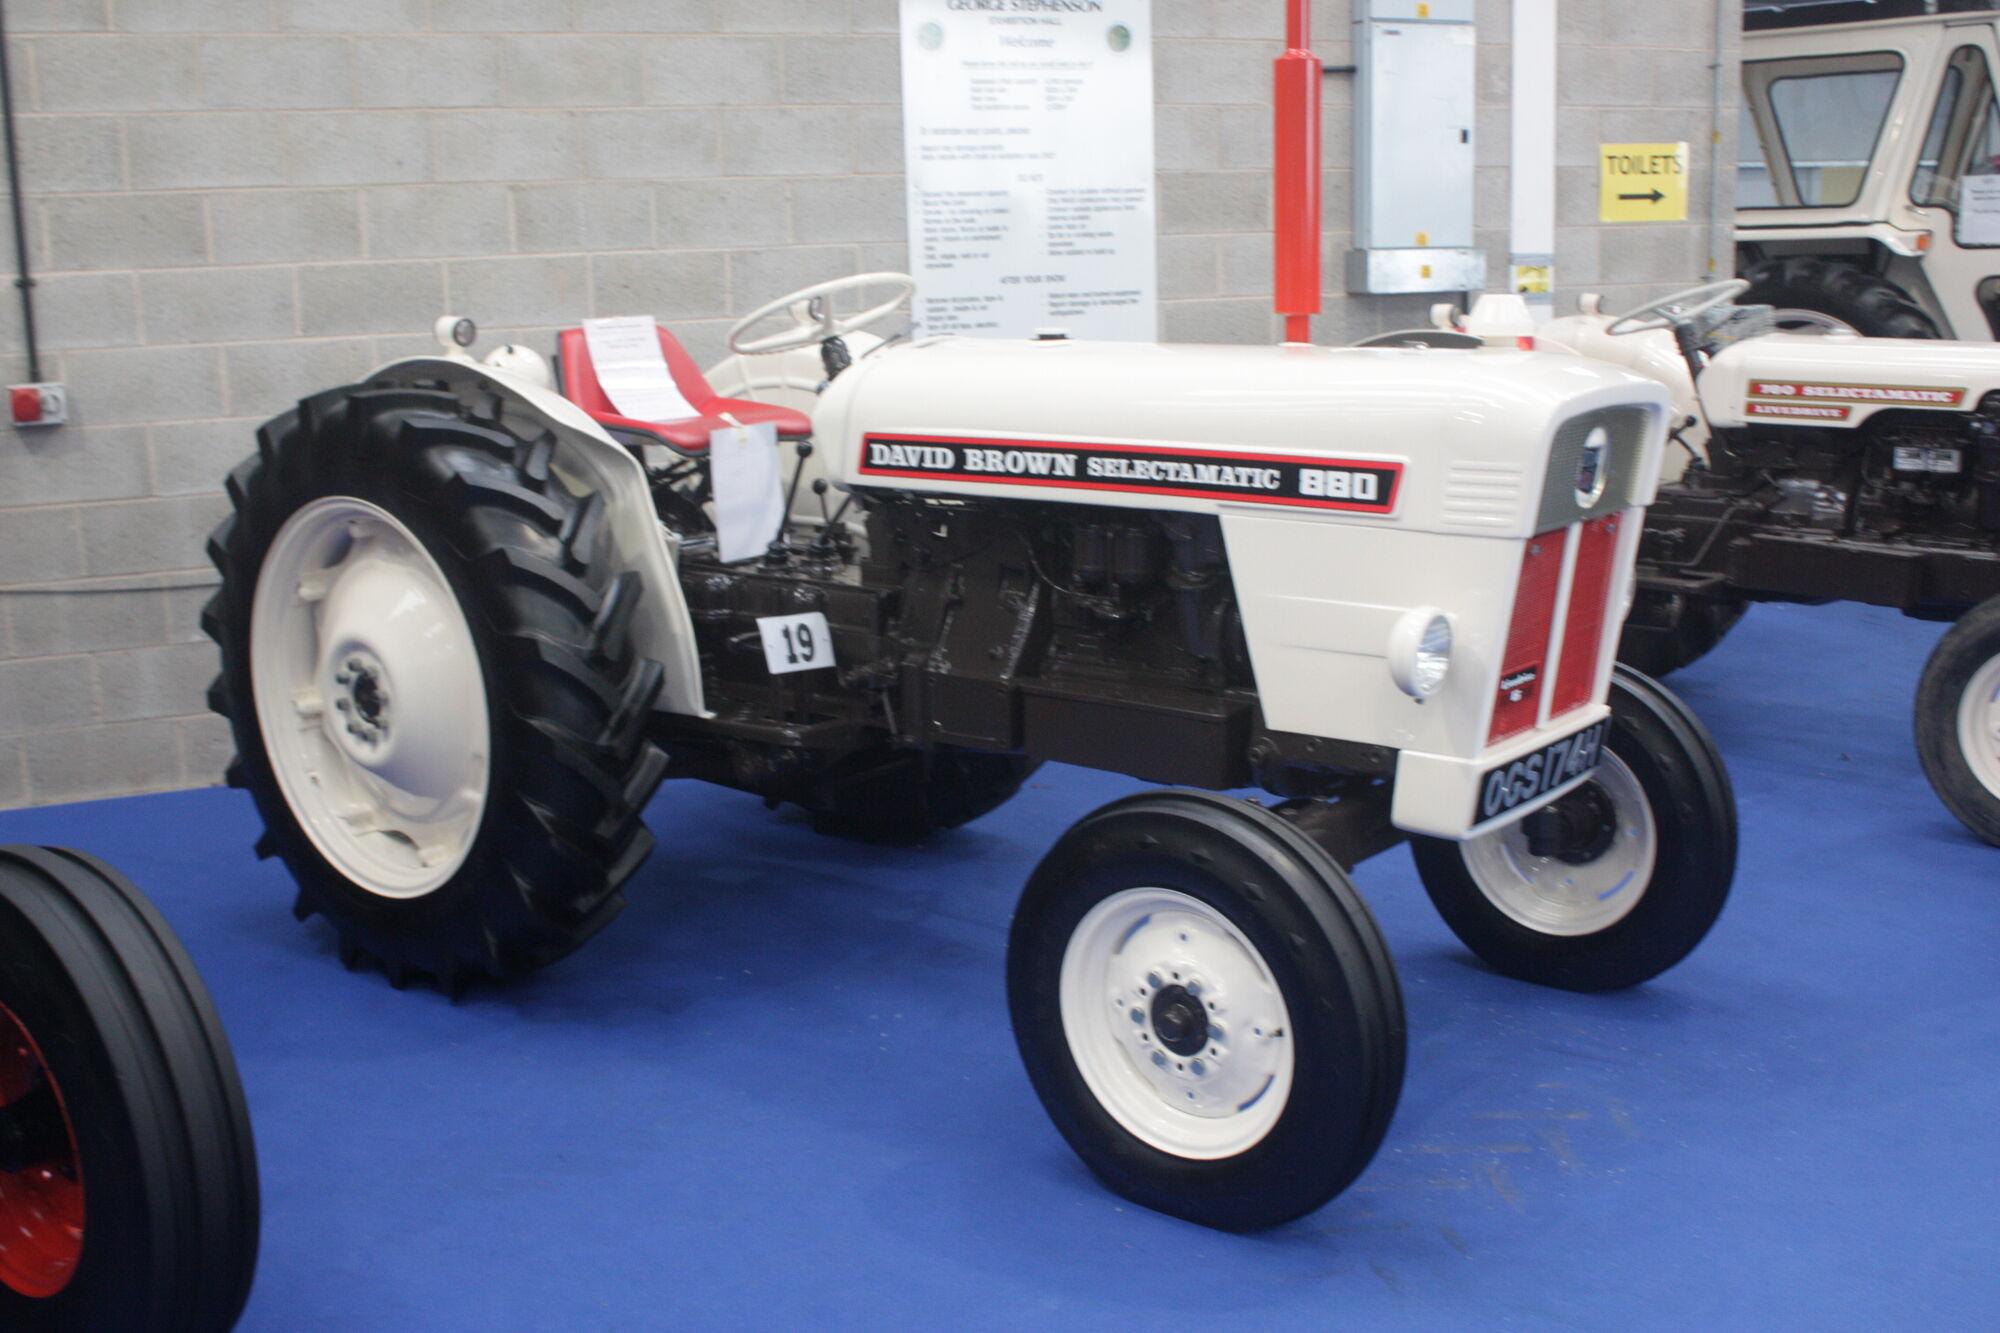 David Brown 880 Selectamatic | Tractor & Construction Plant